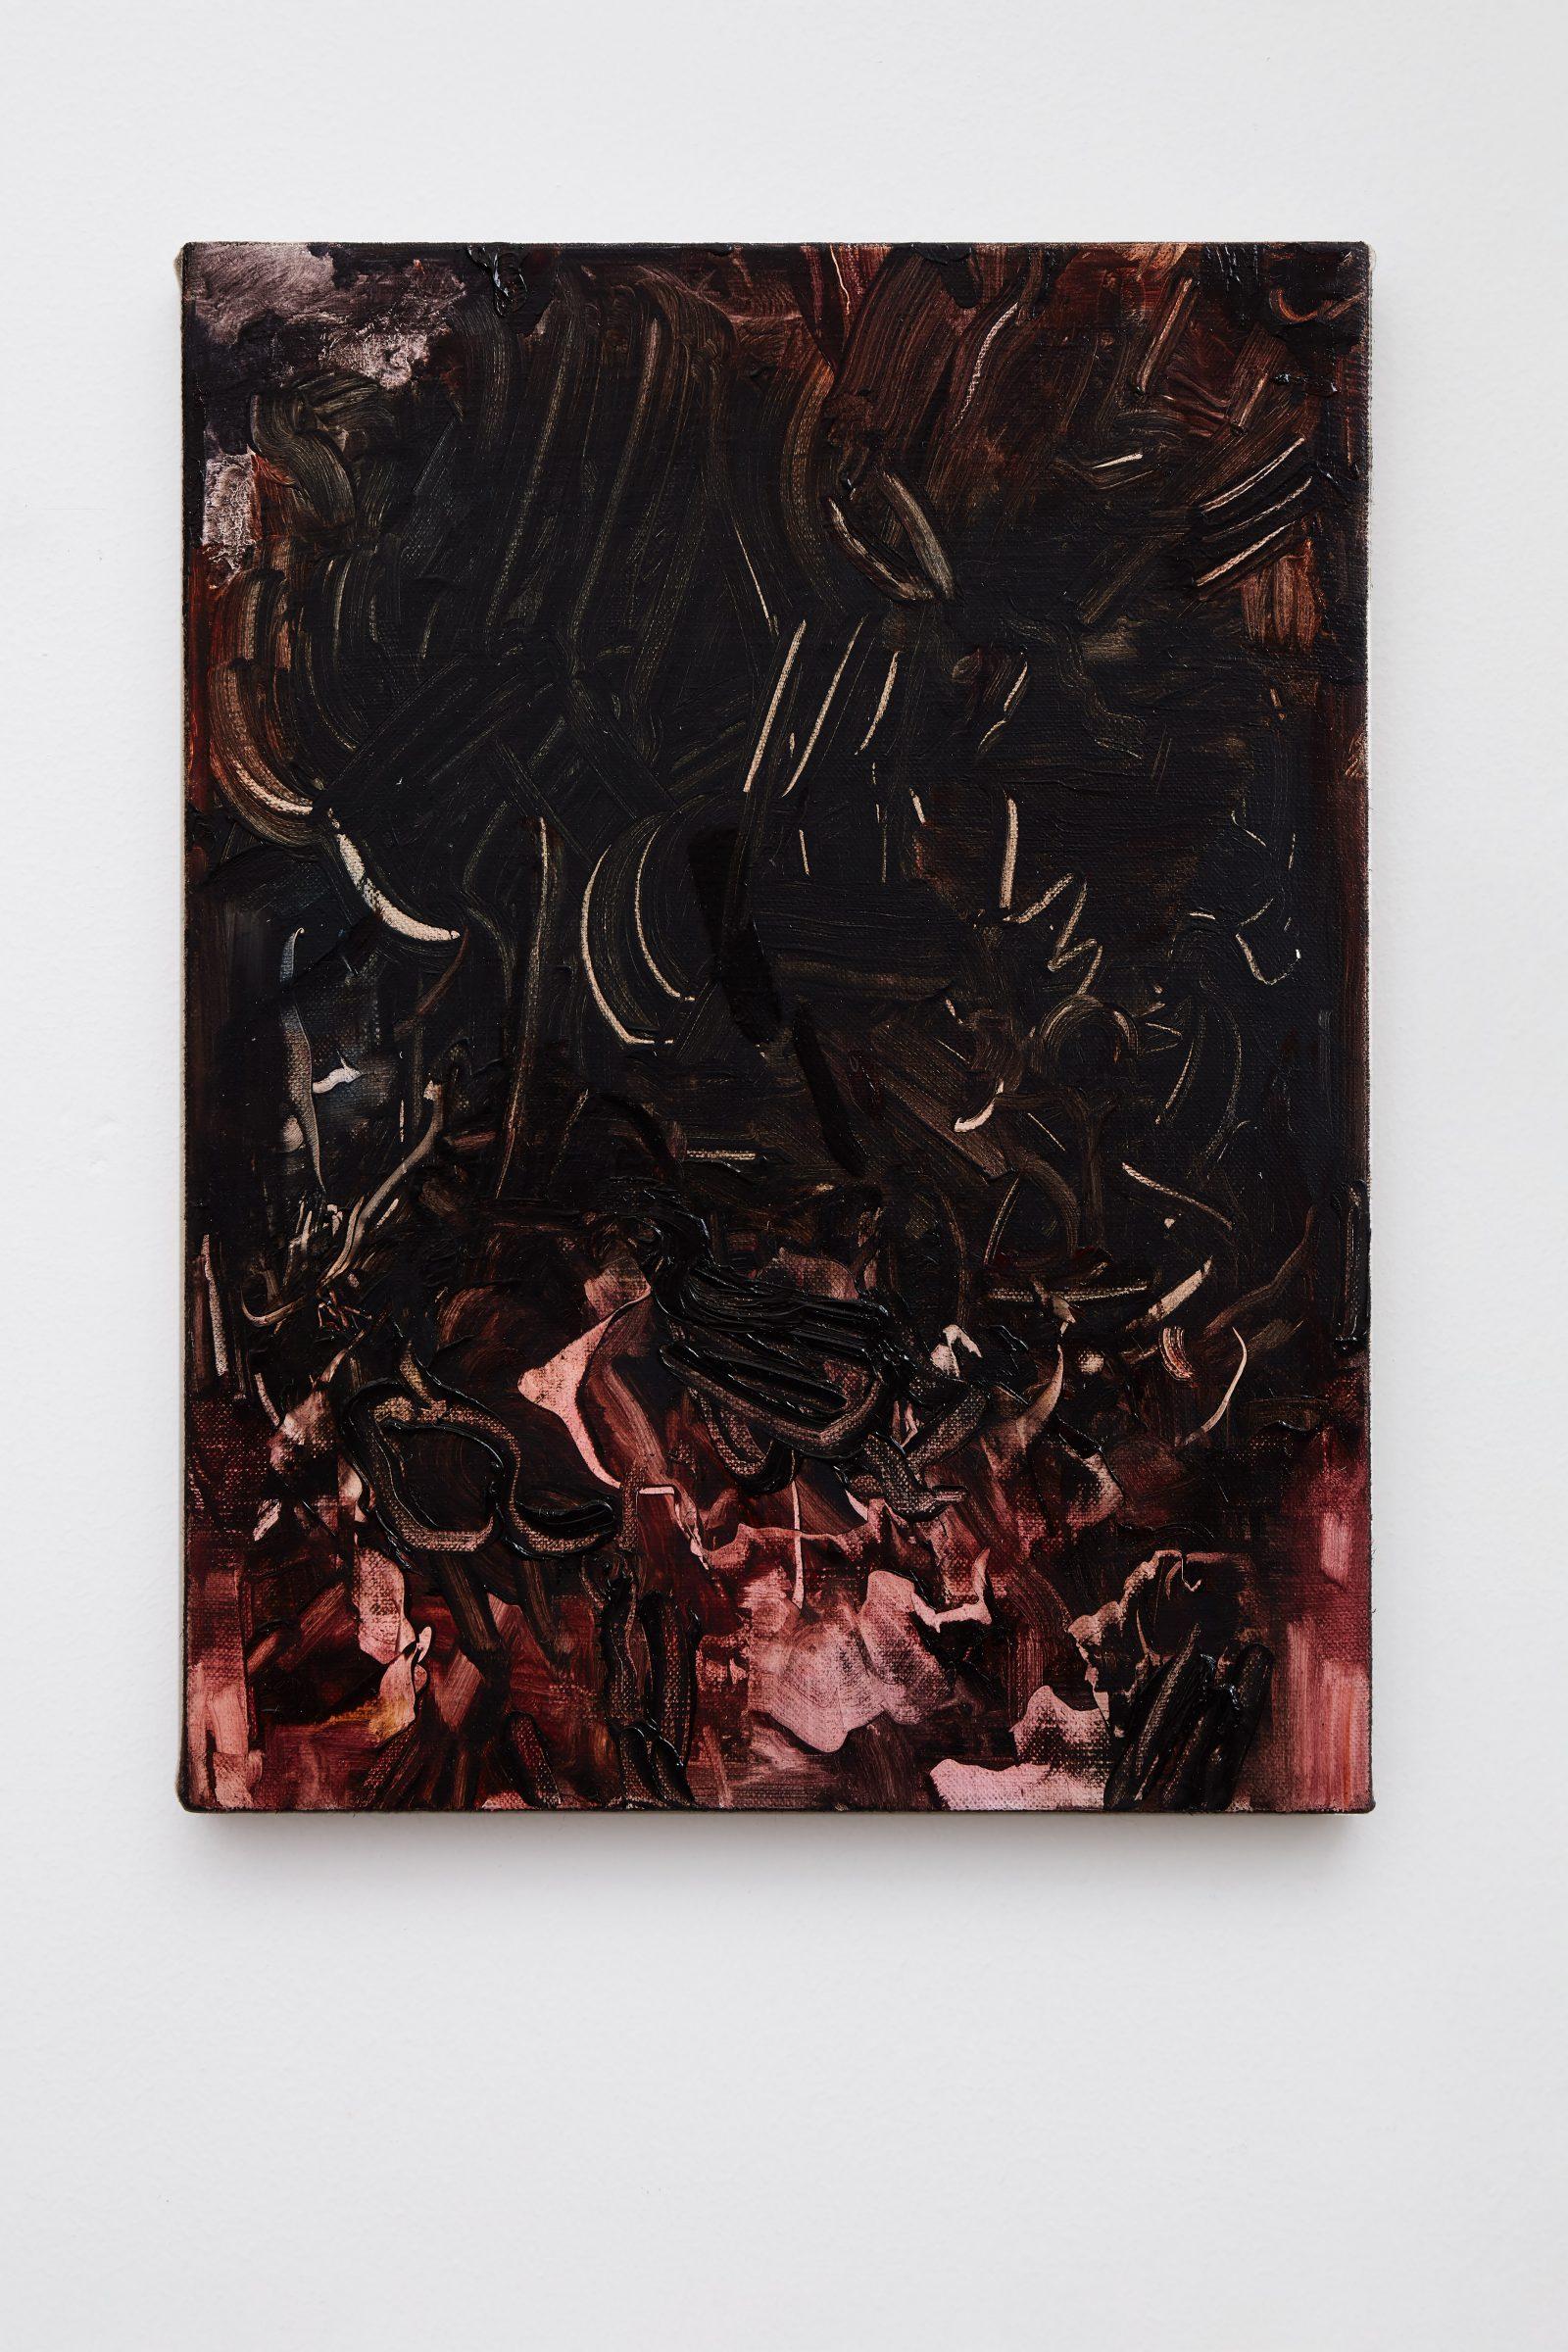 Soleil noir olja på duk, 32x24 cm, 2019